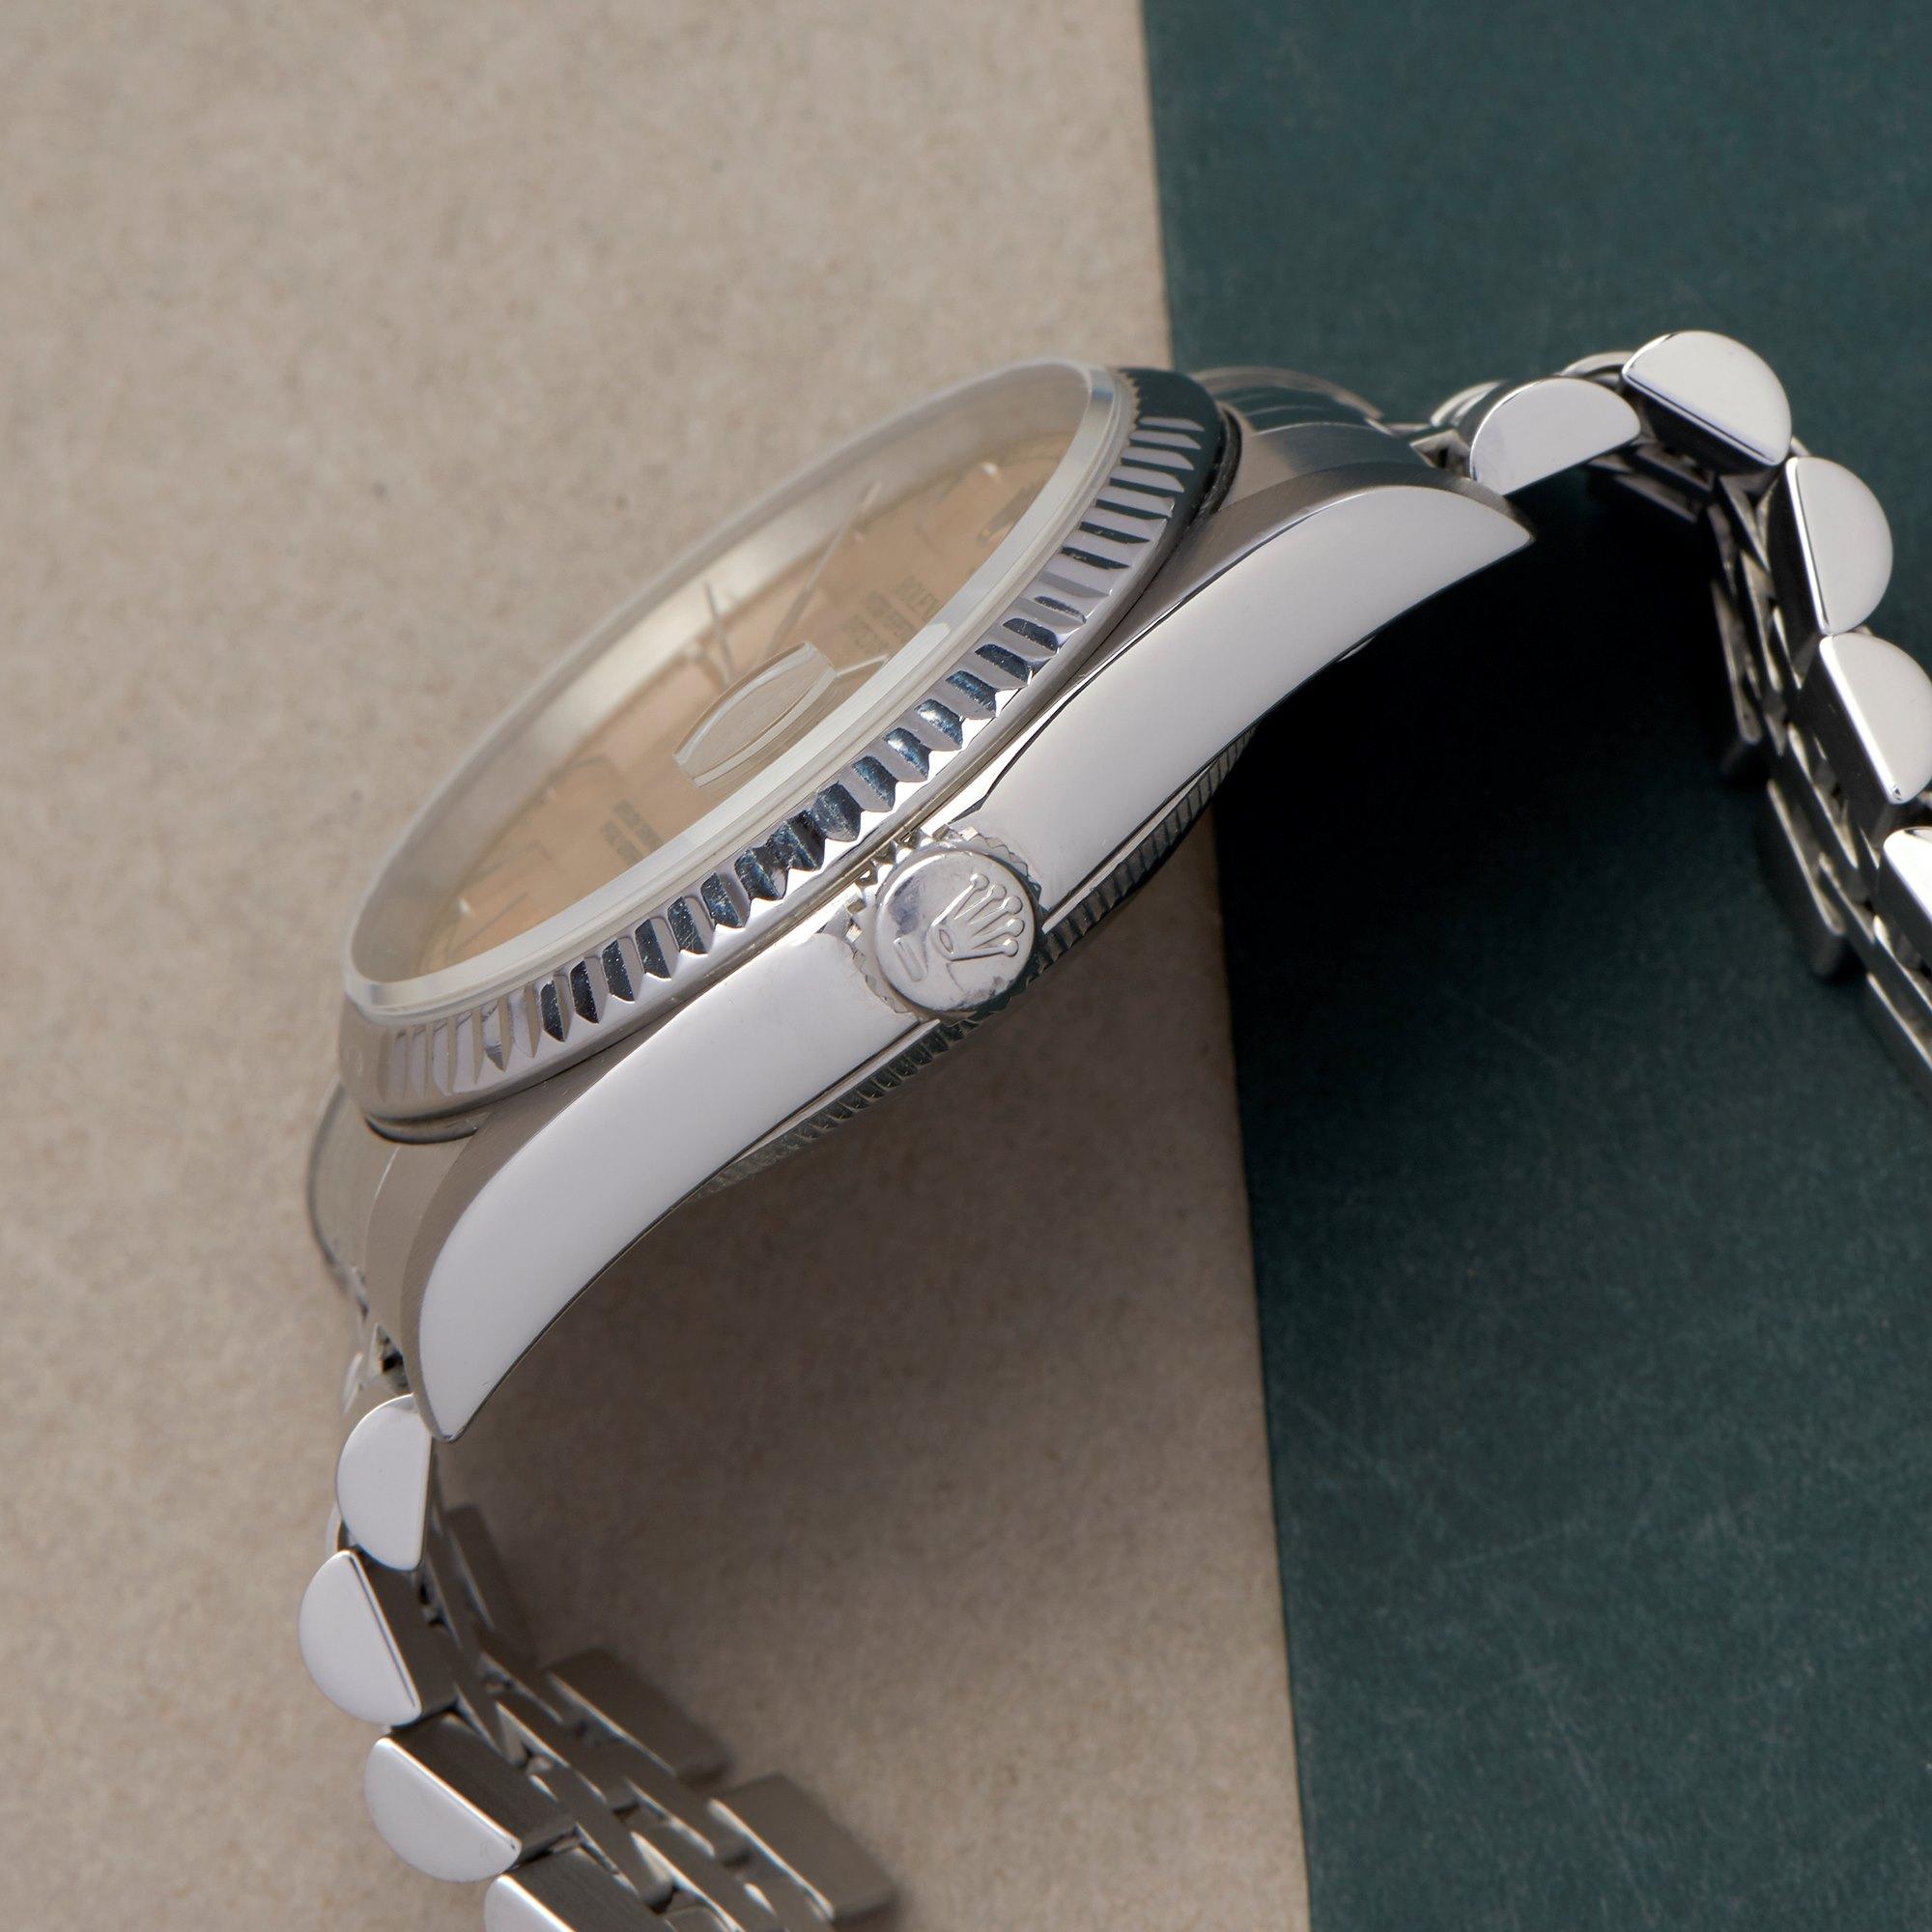 Rolex Datejust Stainless Steel 16200